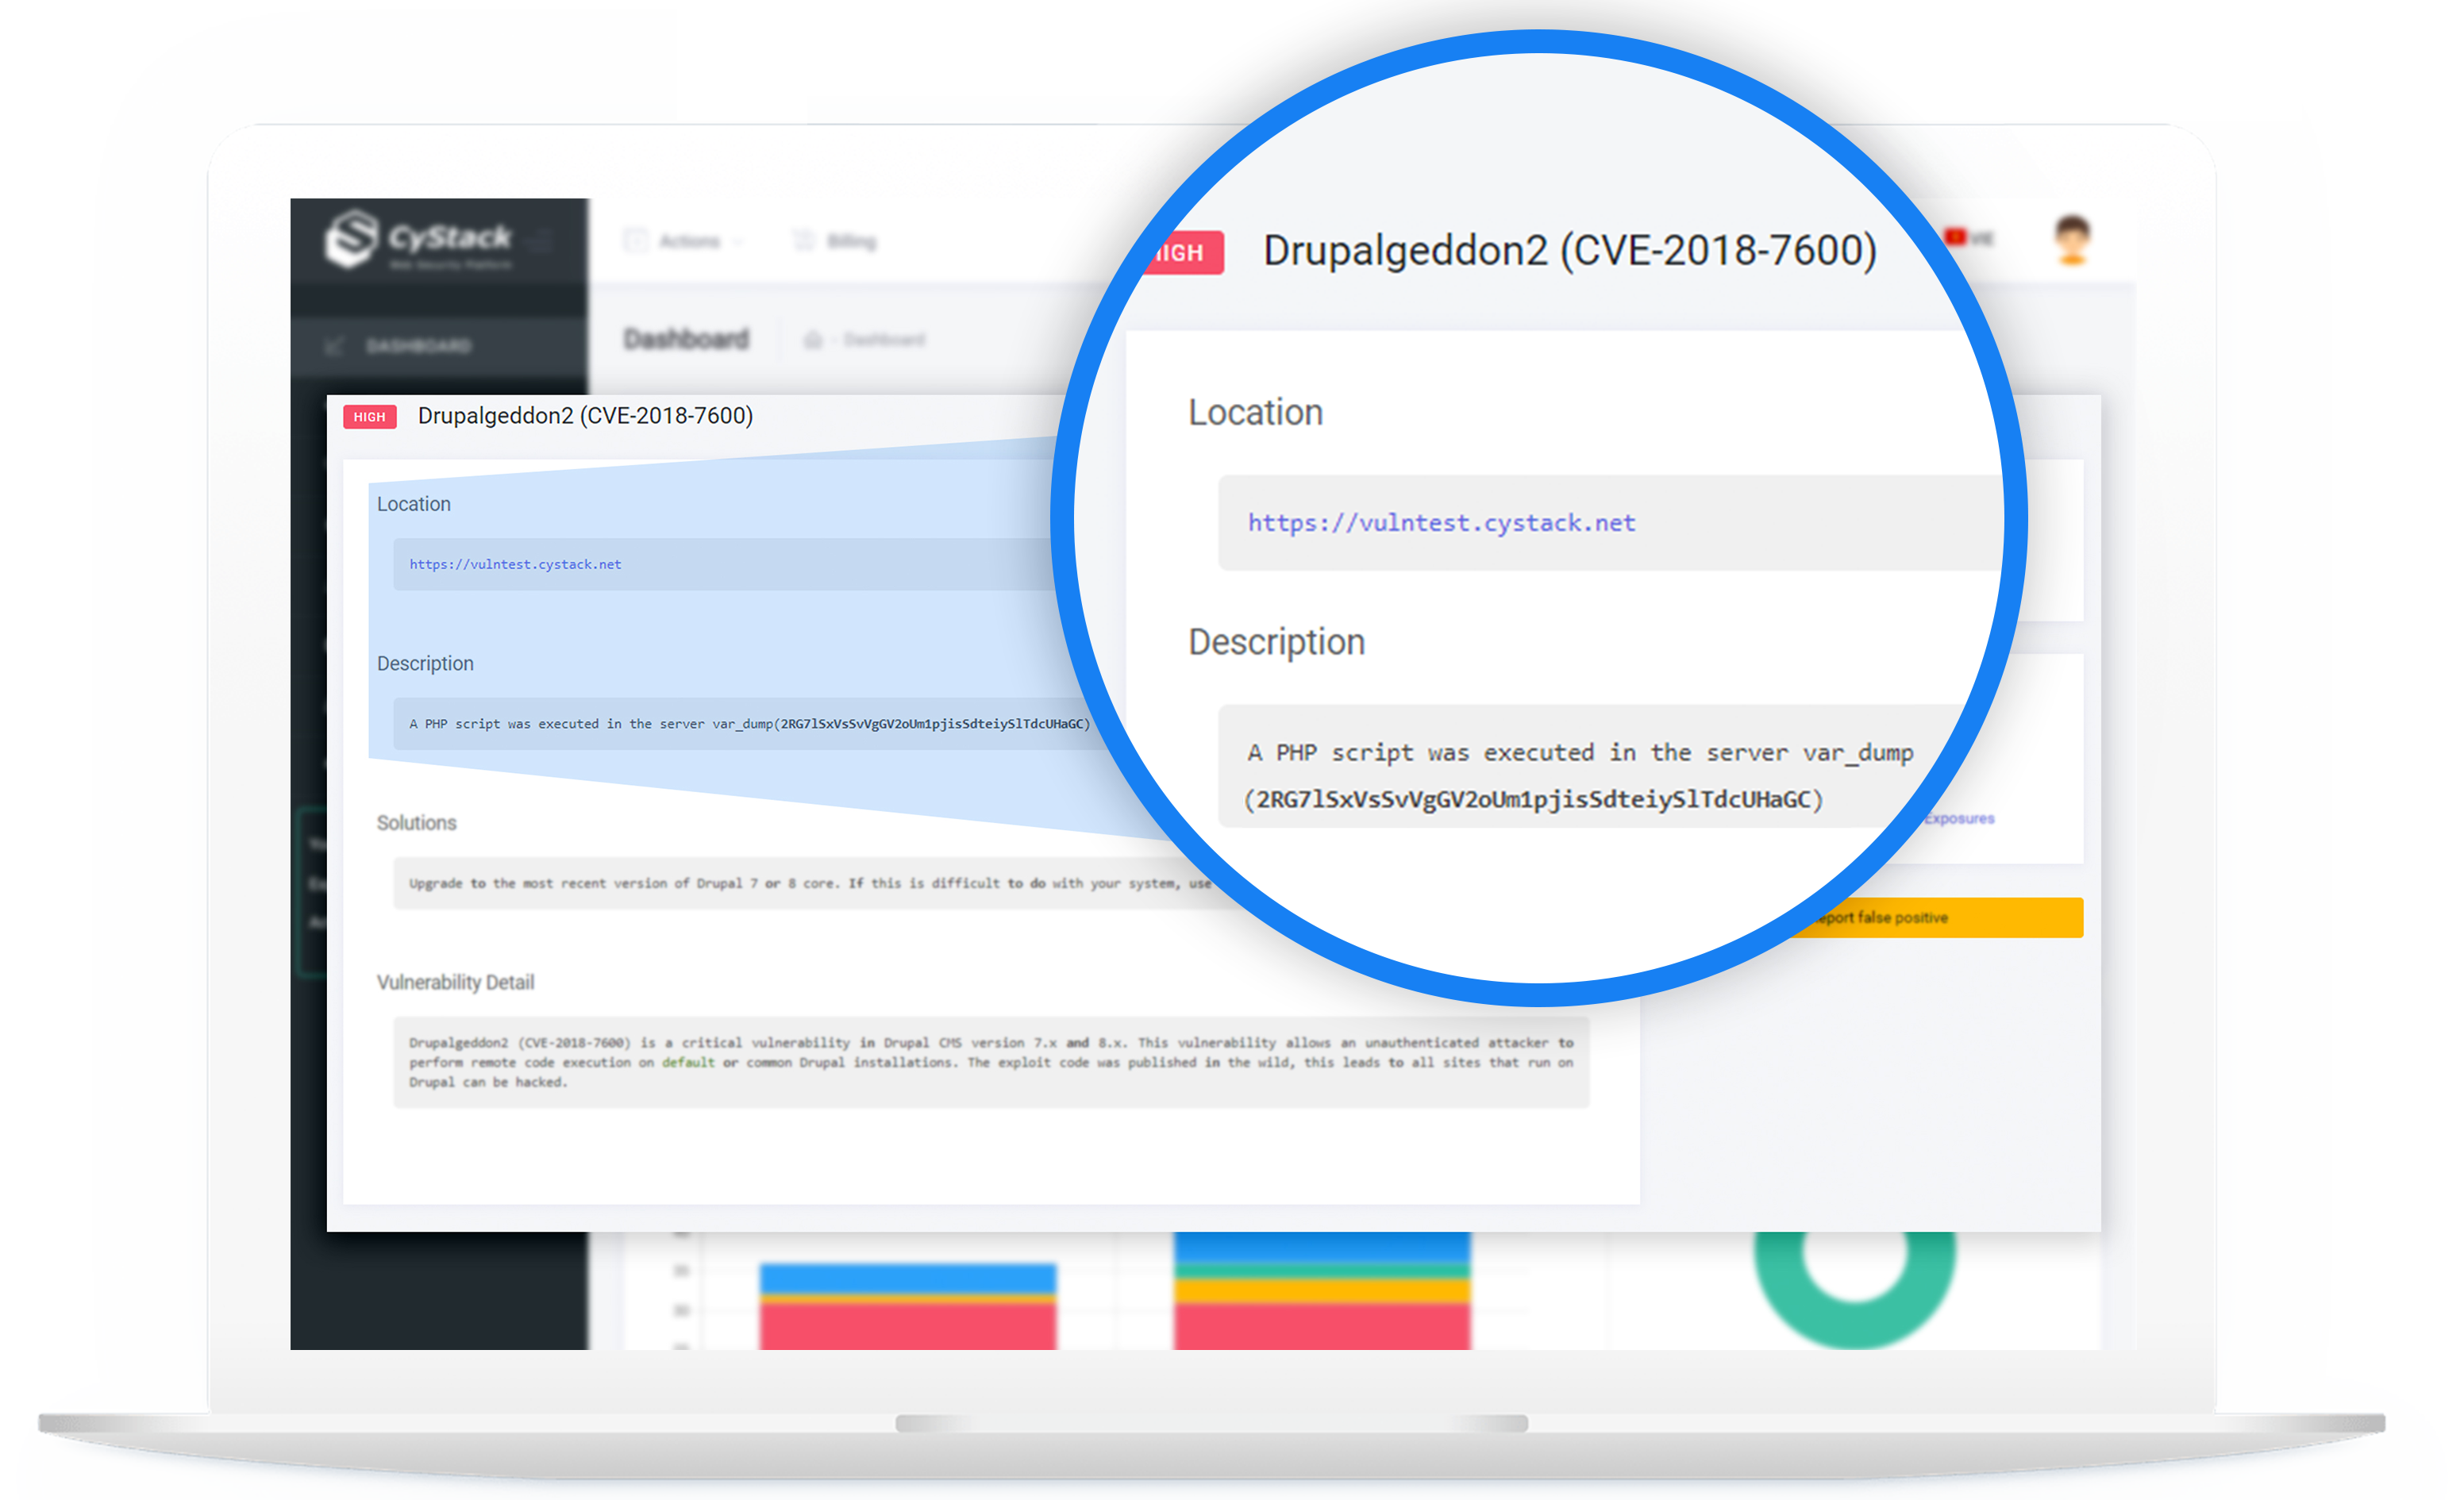 drupalgeddon2 vulnerability